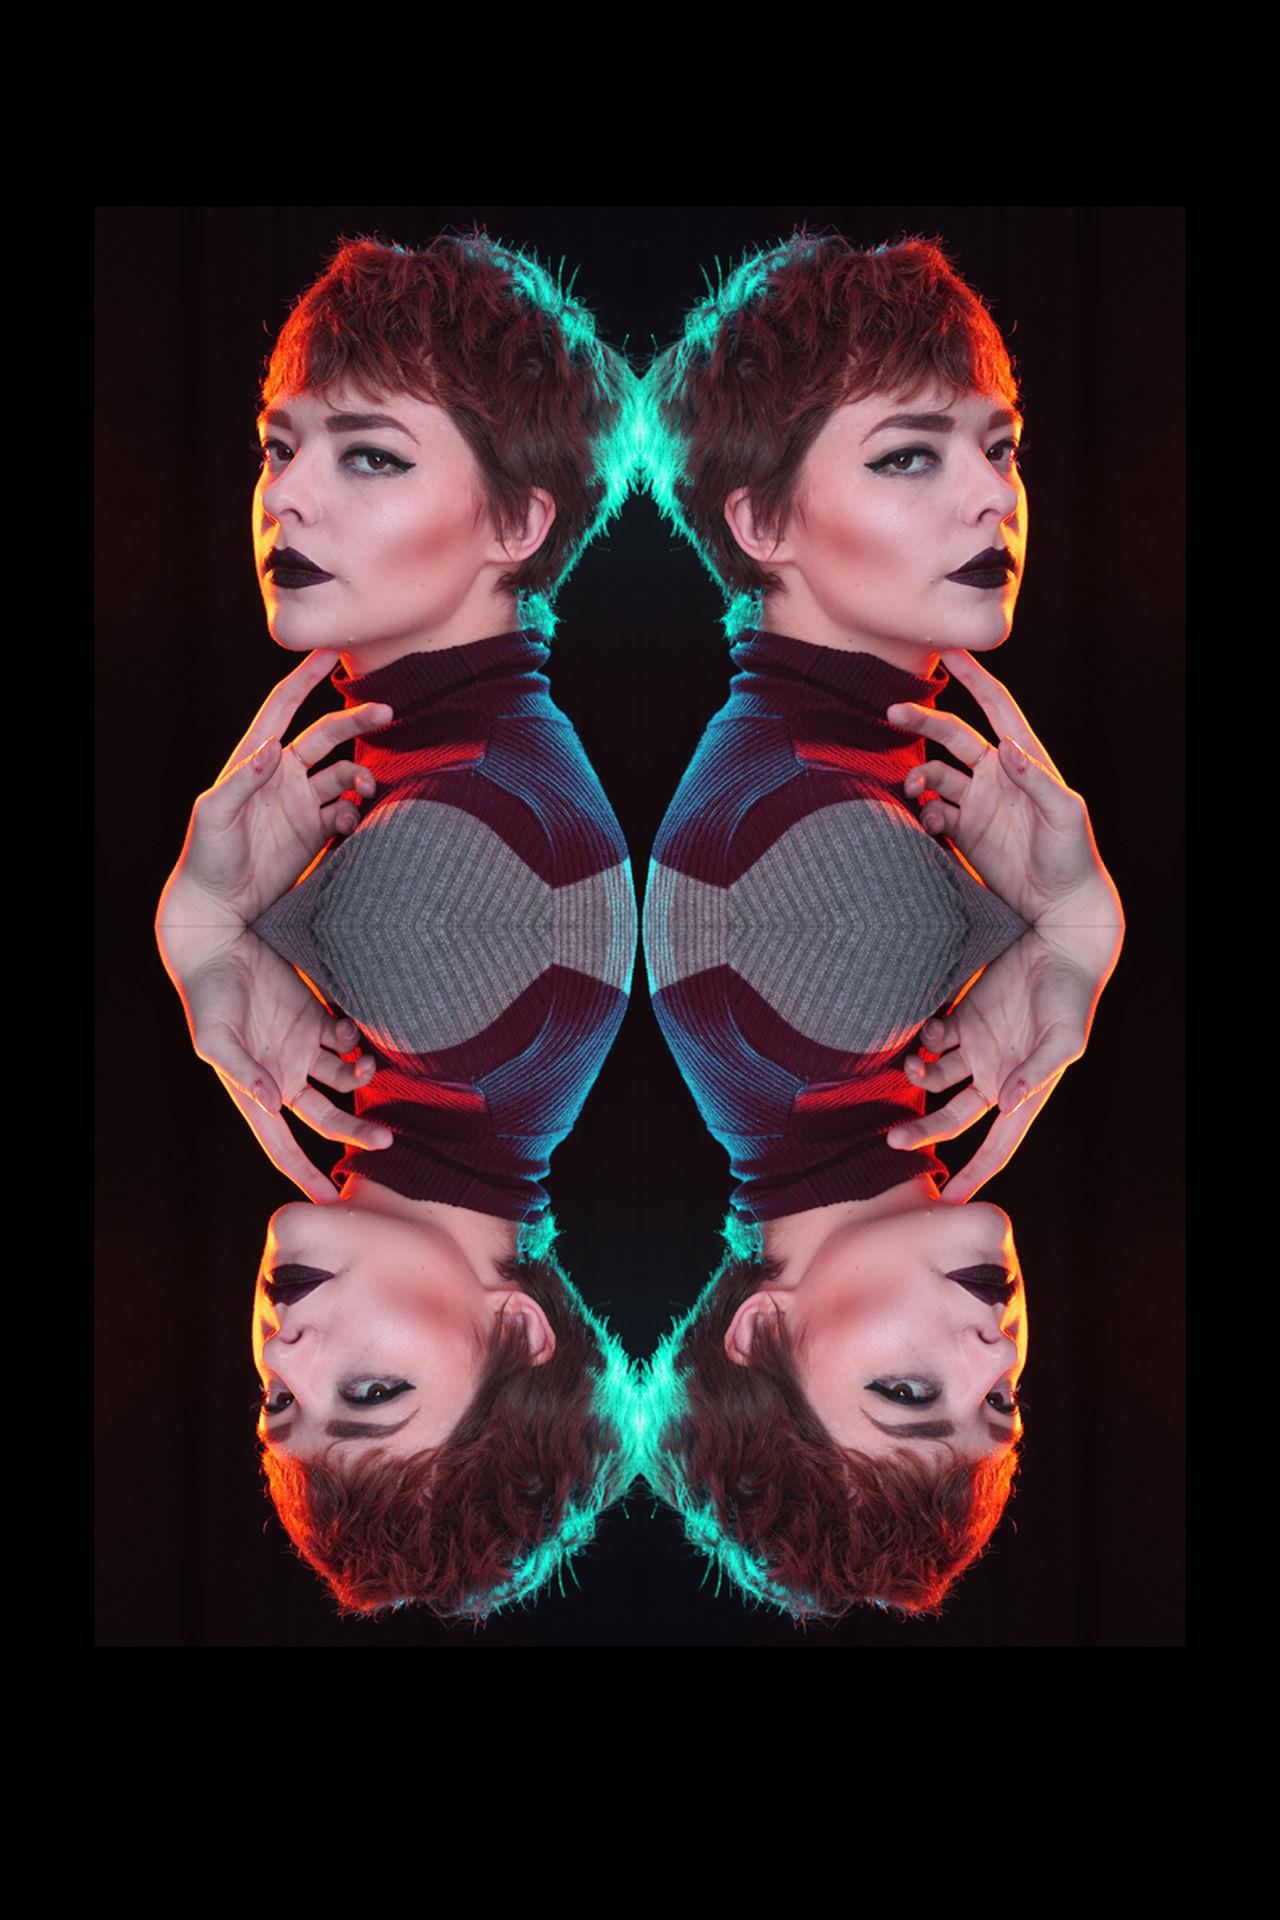 Creative Creative Light And Shadow Gel Lighting Photoshop Portrait Portrait Of A Woman Studio Photography Studio Shot